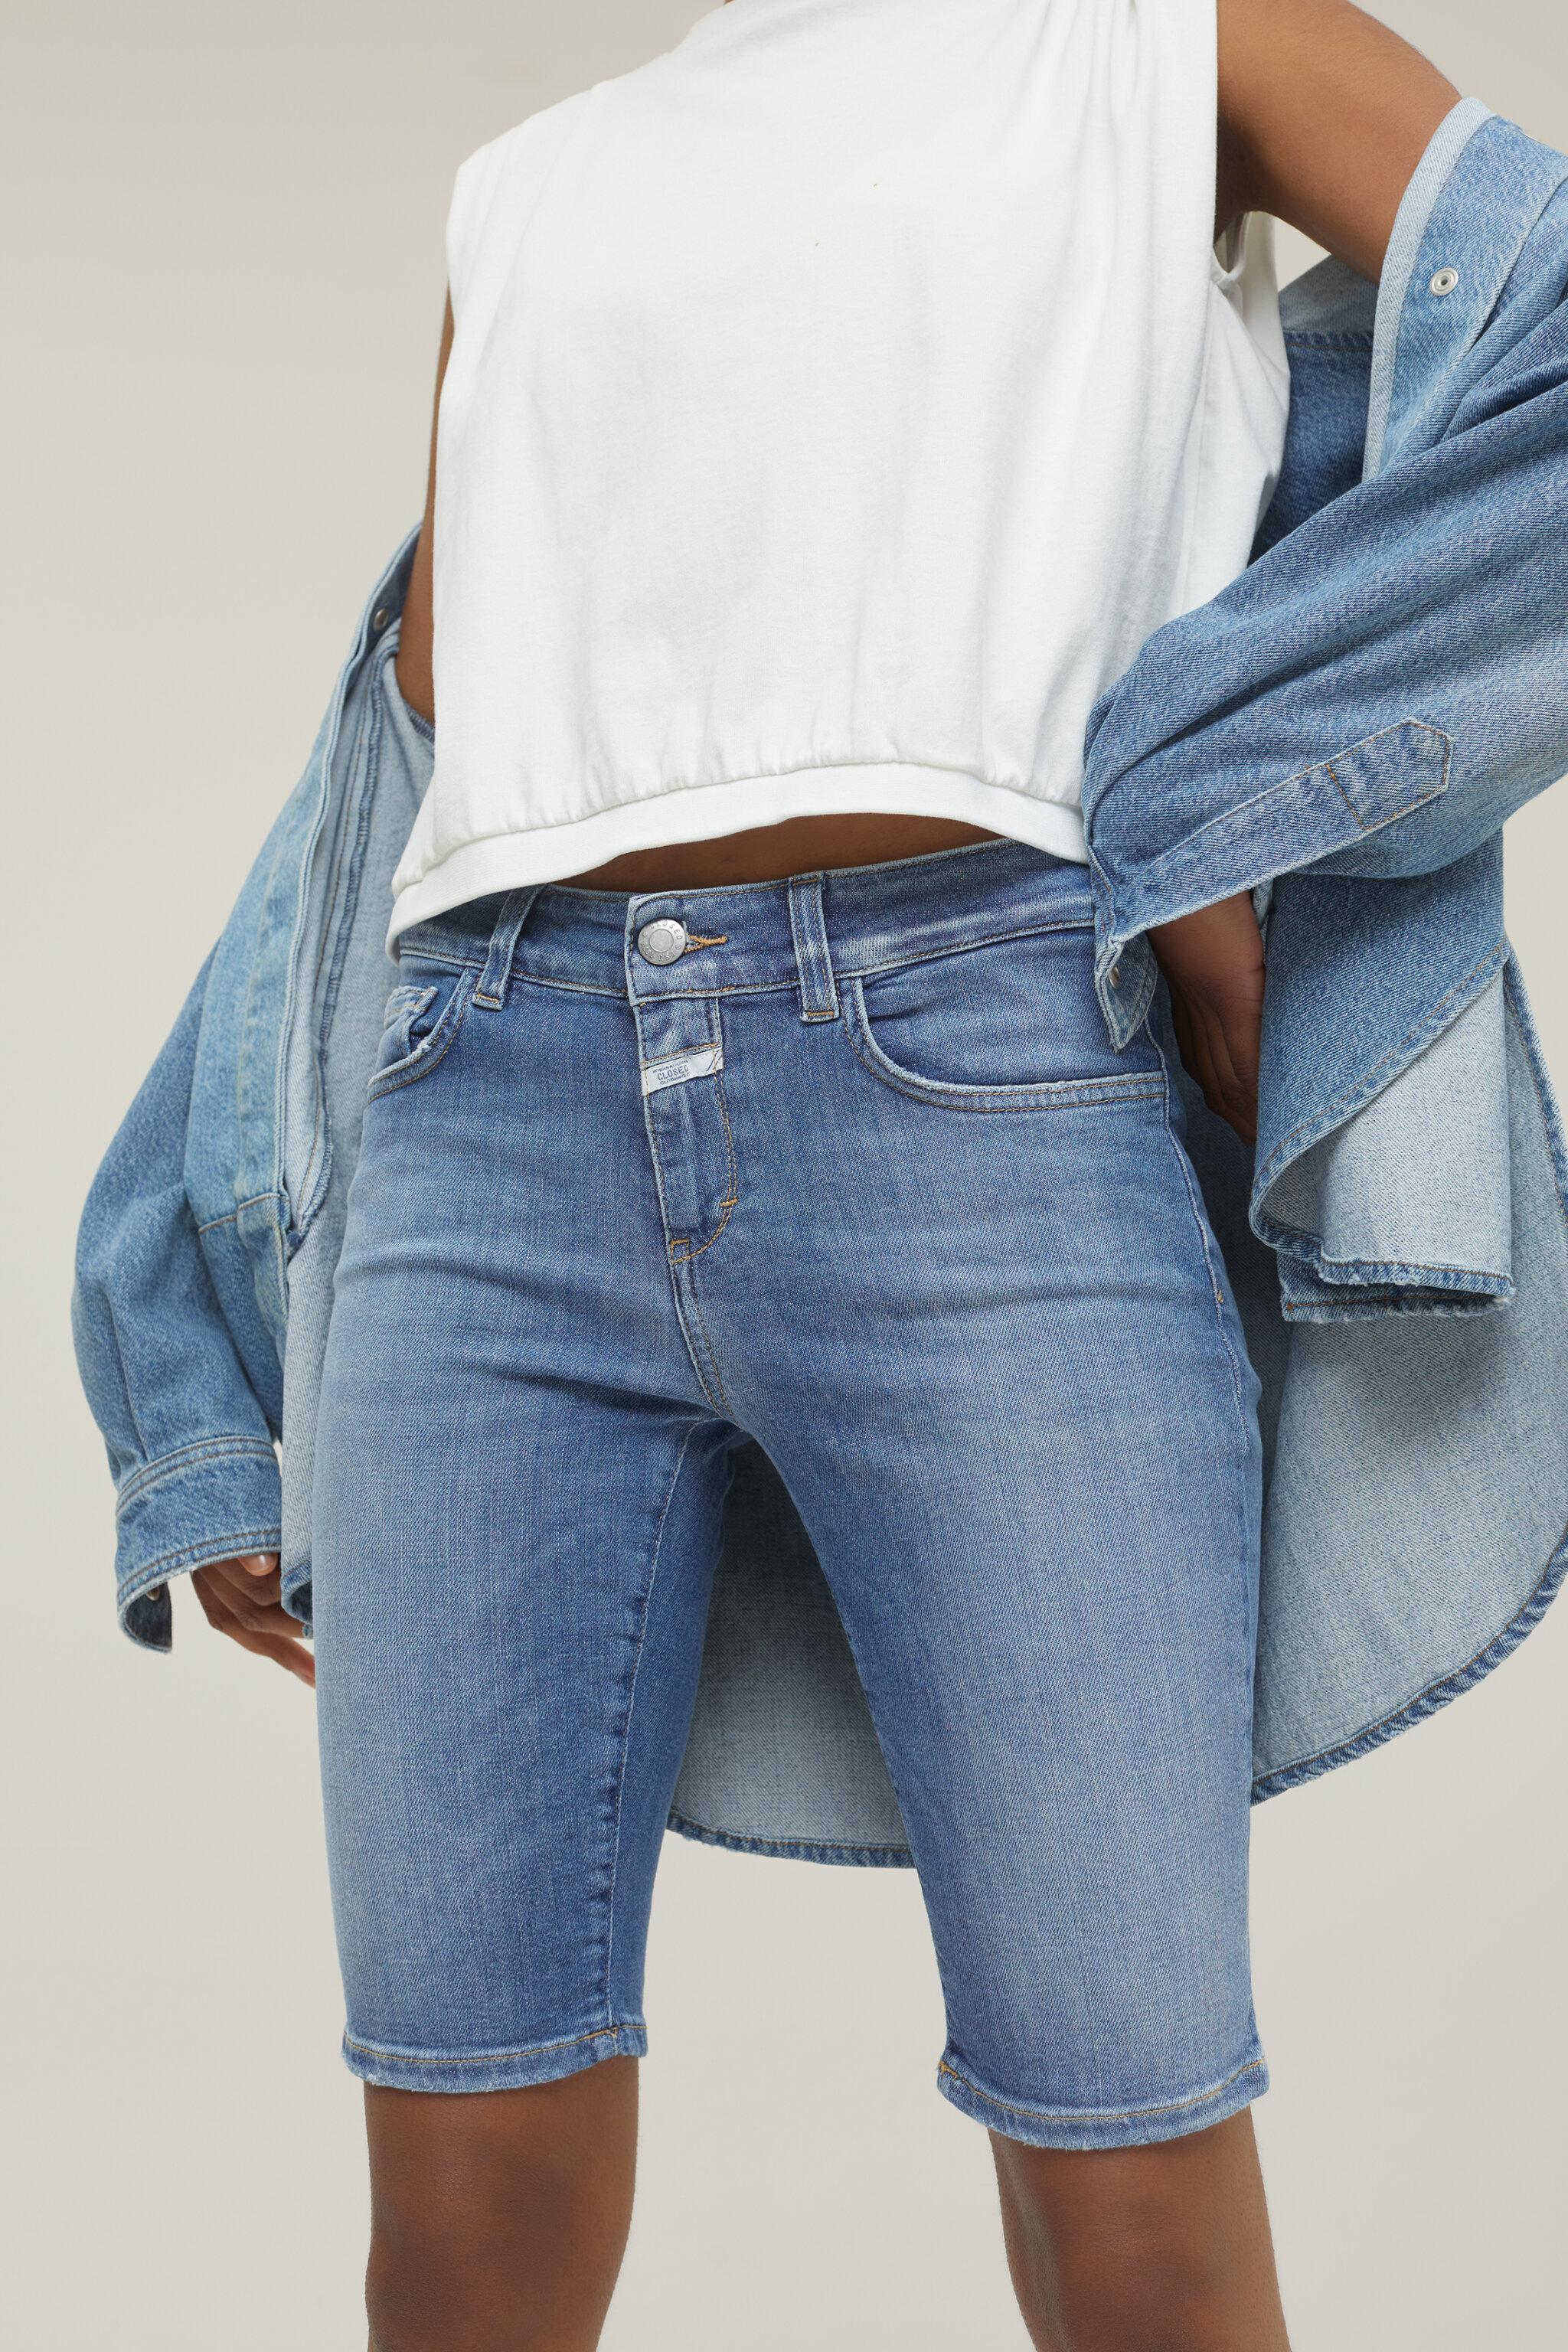 Damen CLOSED  Baker Shorts Blue Super Stretch Denim mid blue   4054736907887